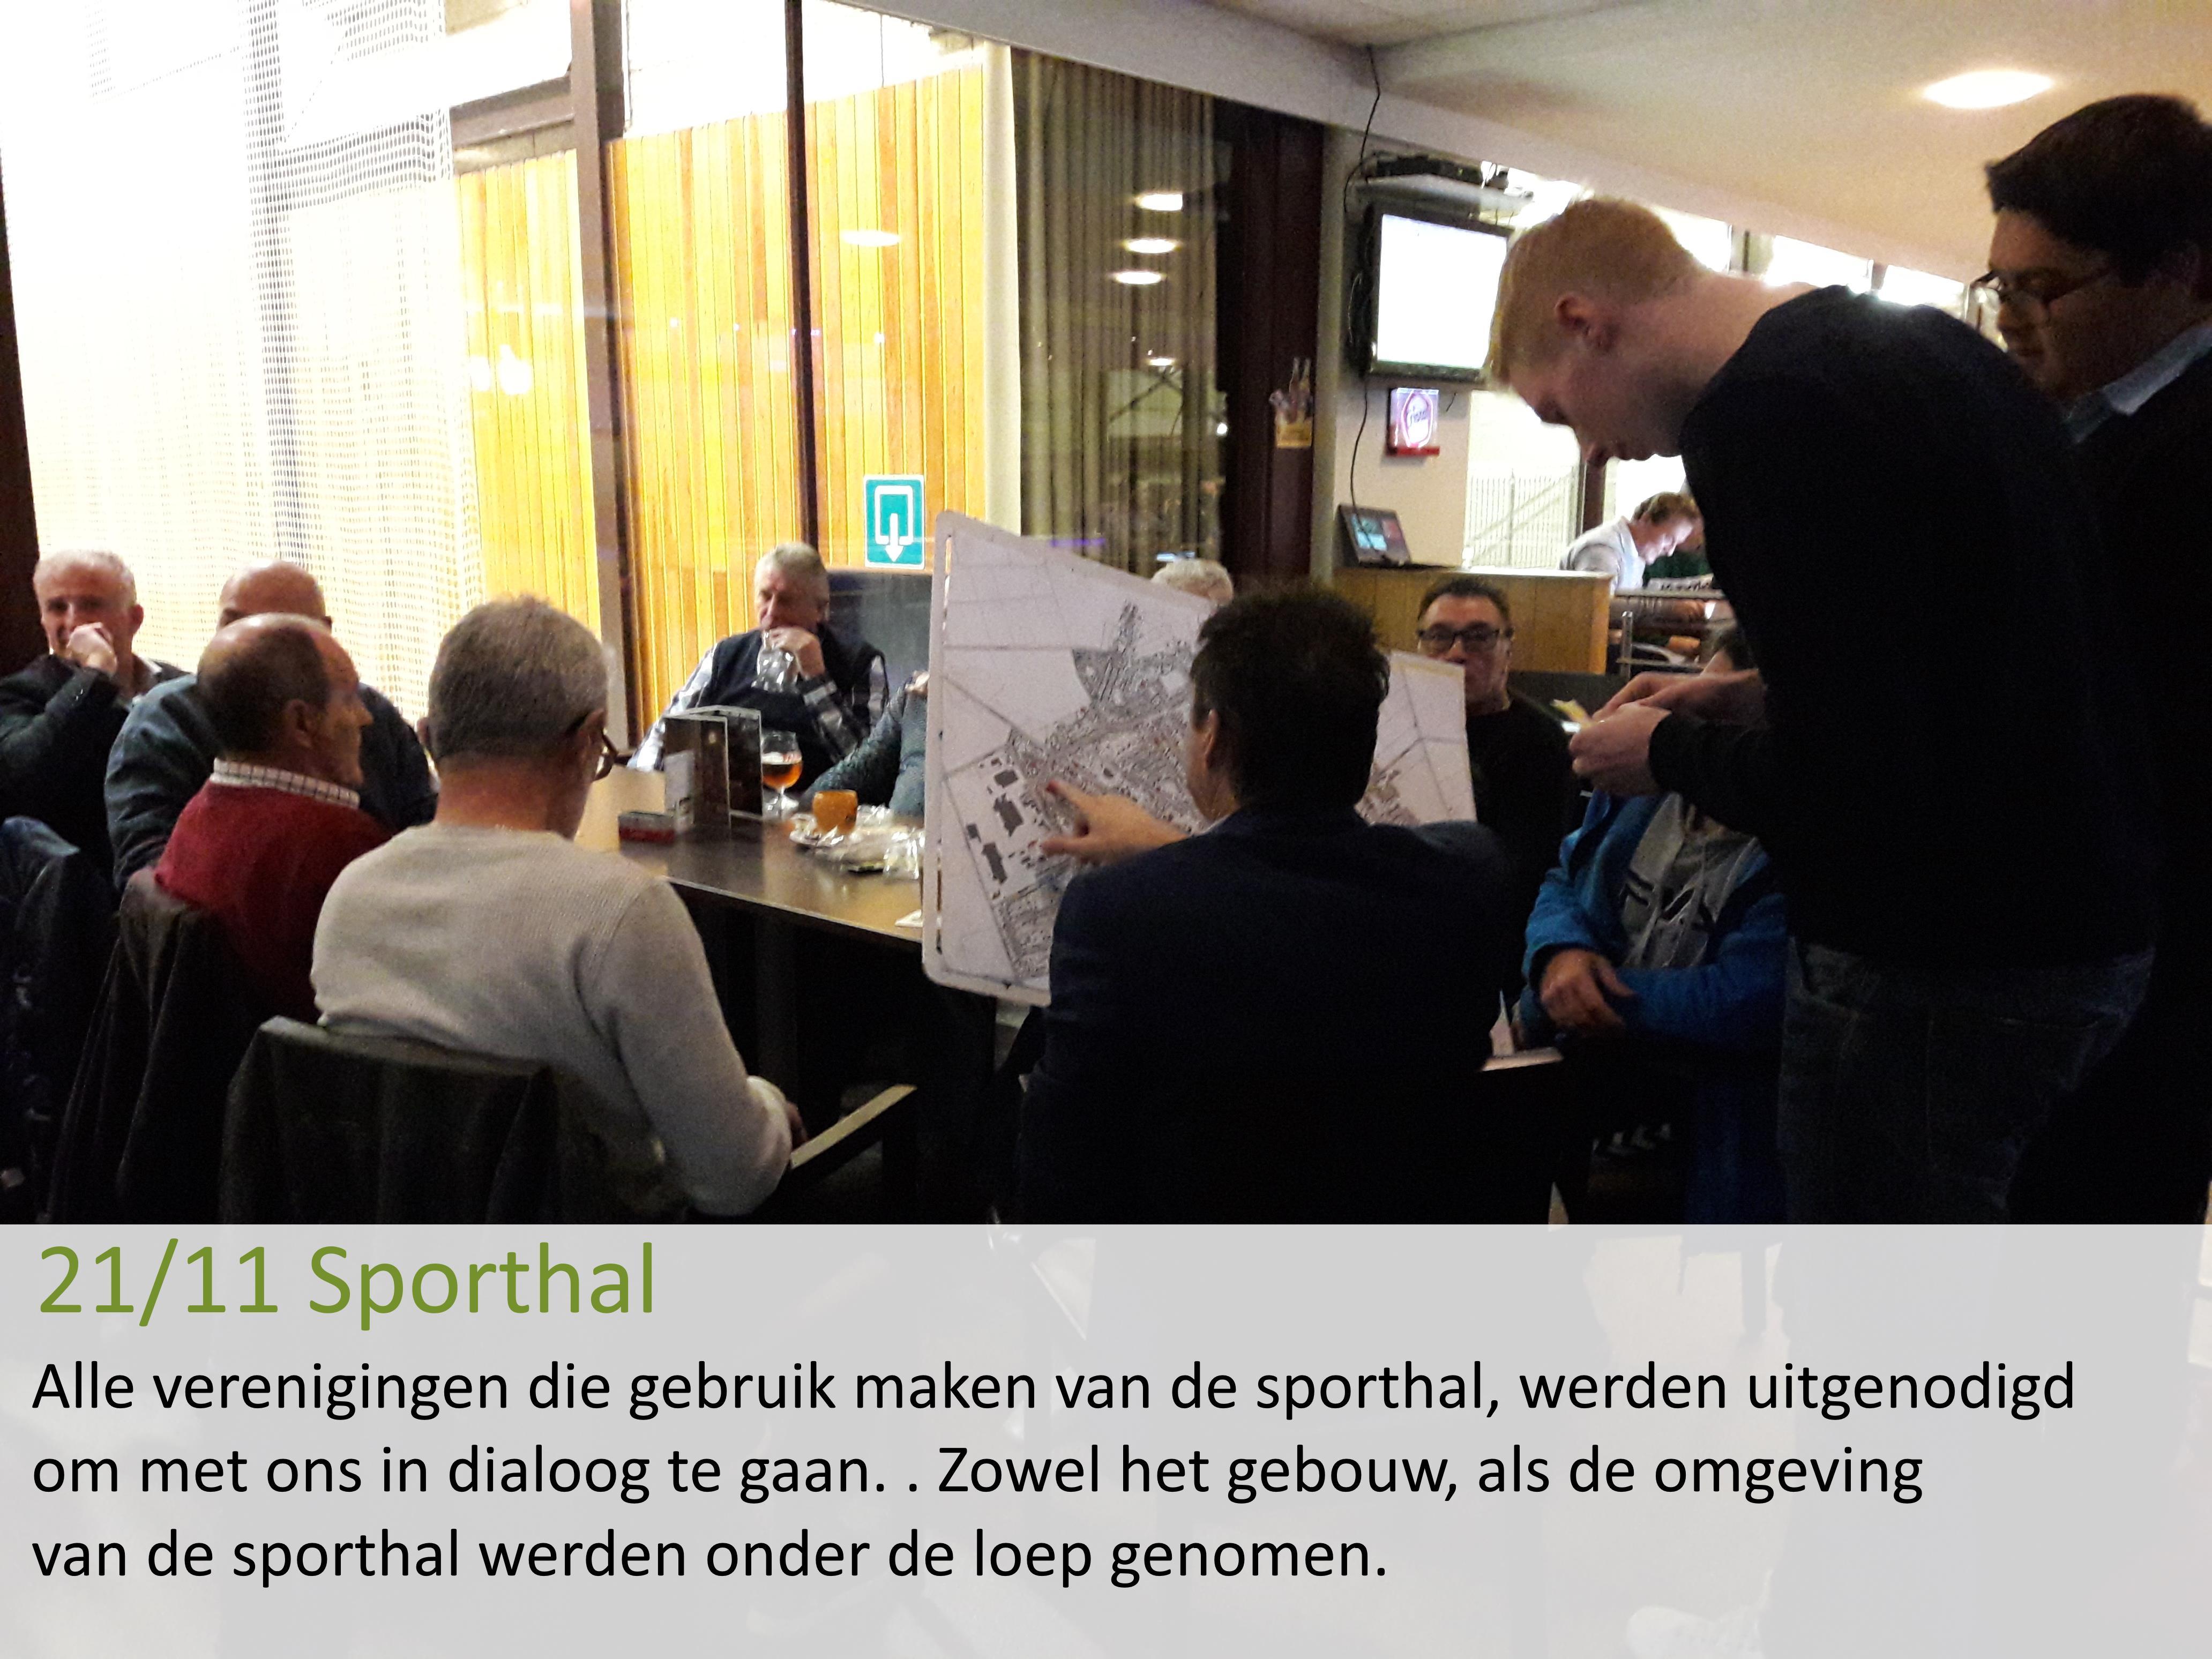 21/11 Sporthal